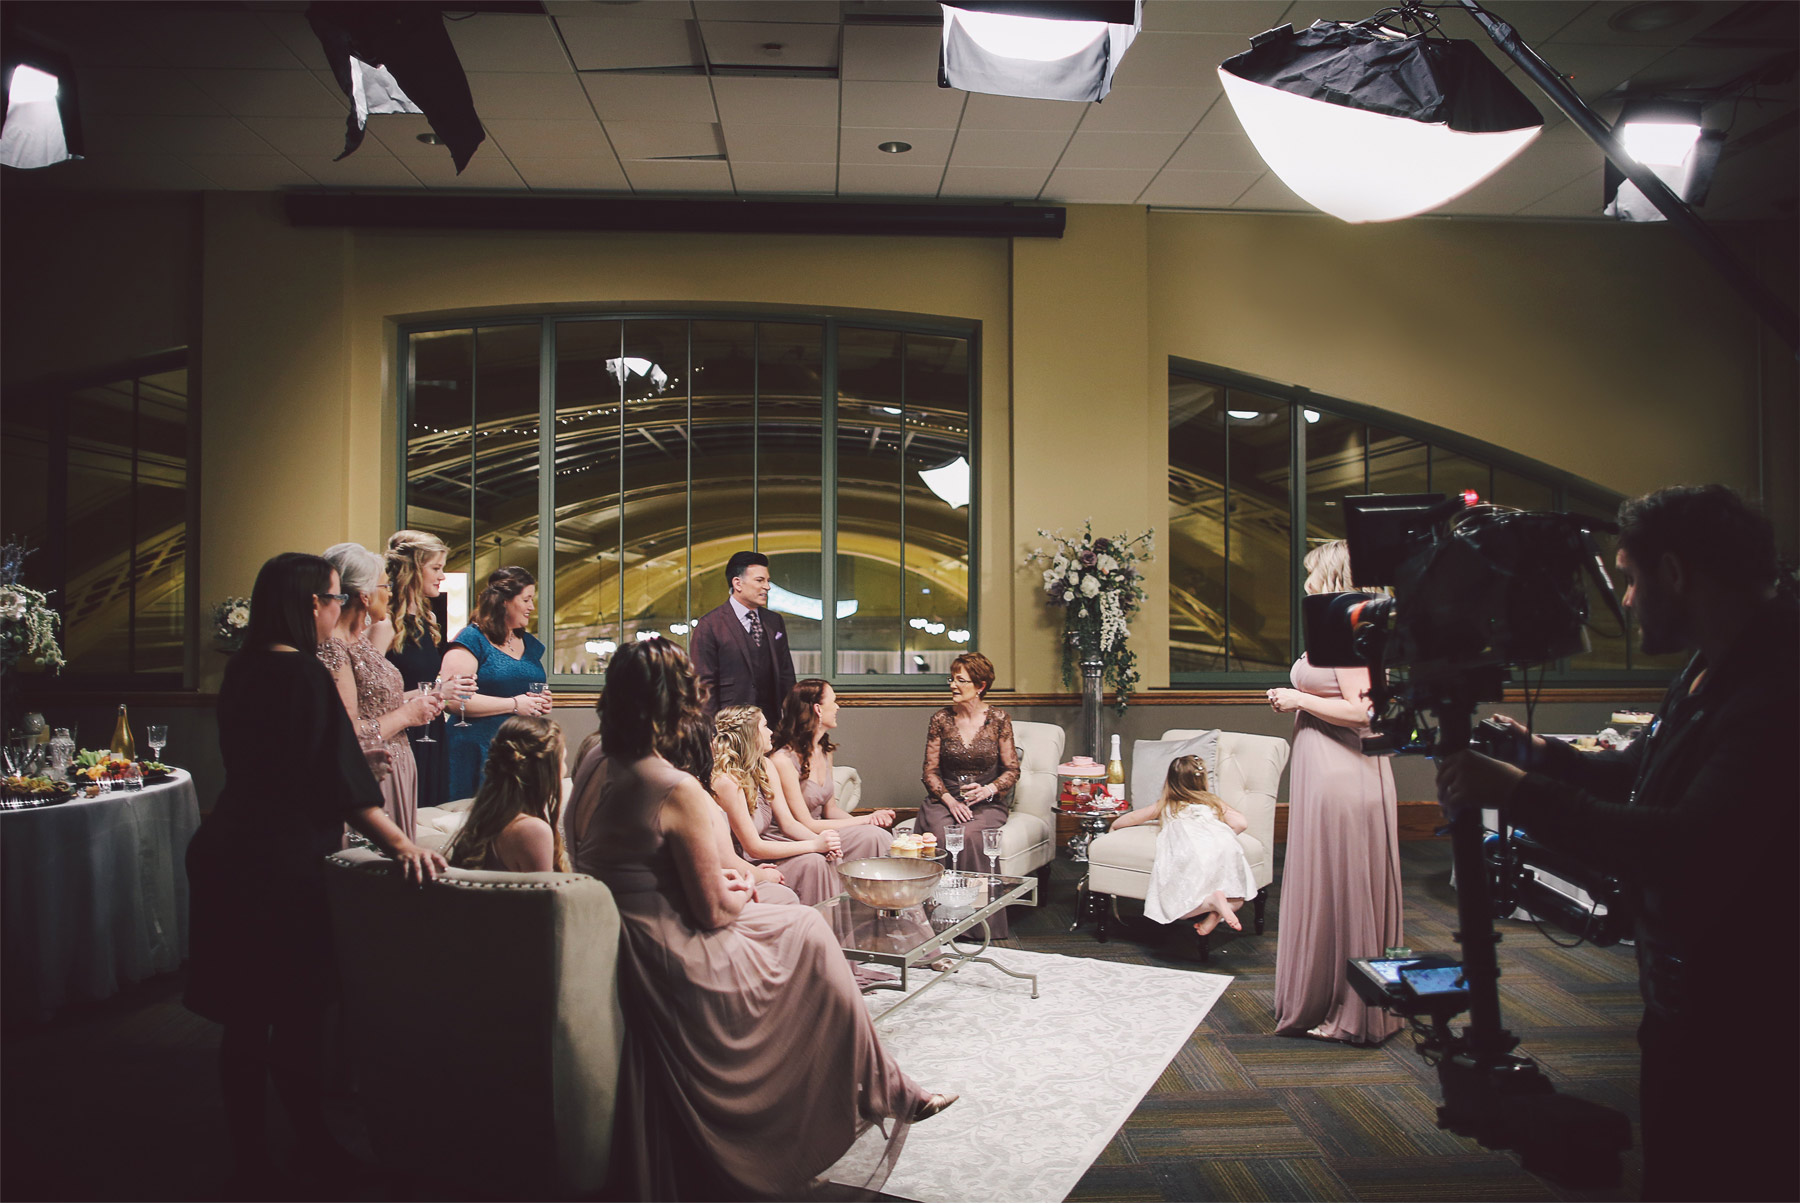 03-Andrew-Vick-Photography-My-Great-Big-Live-Wedding-with-David-Tutera-Behind-the-Scenes-Minnesota-Union-Depot-Saint-Paul.jpg